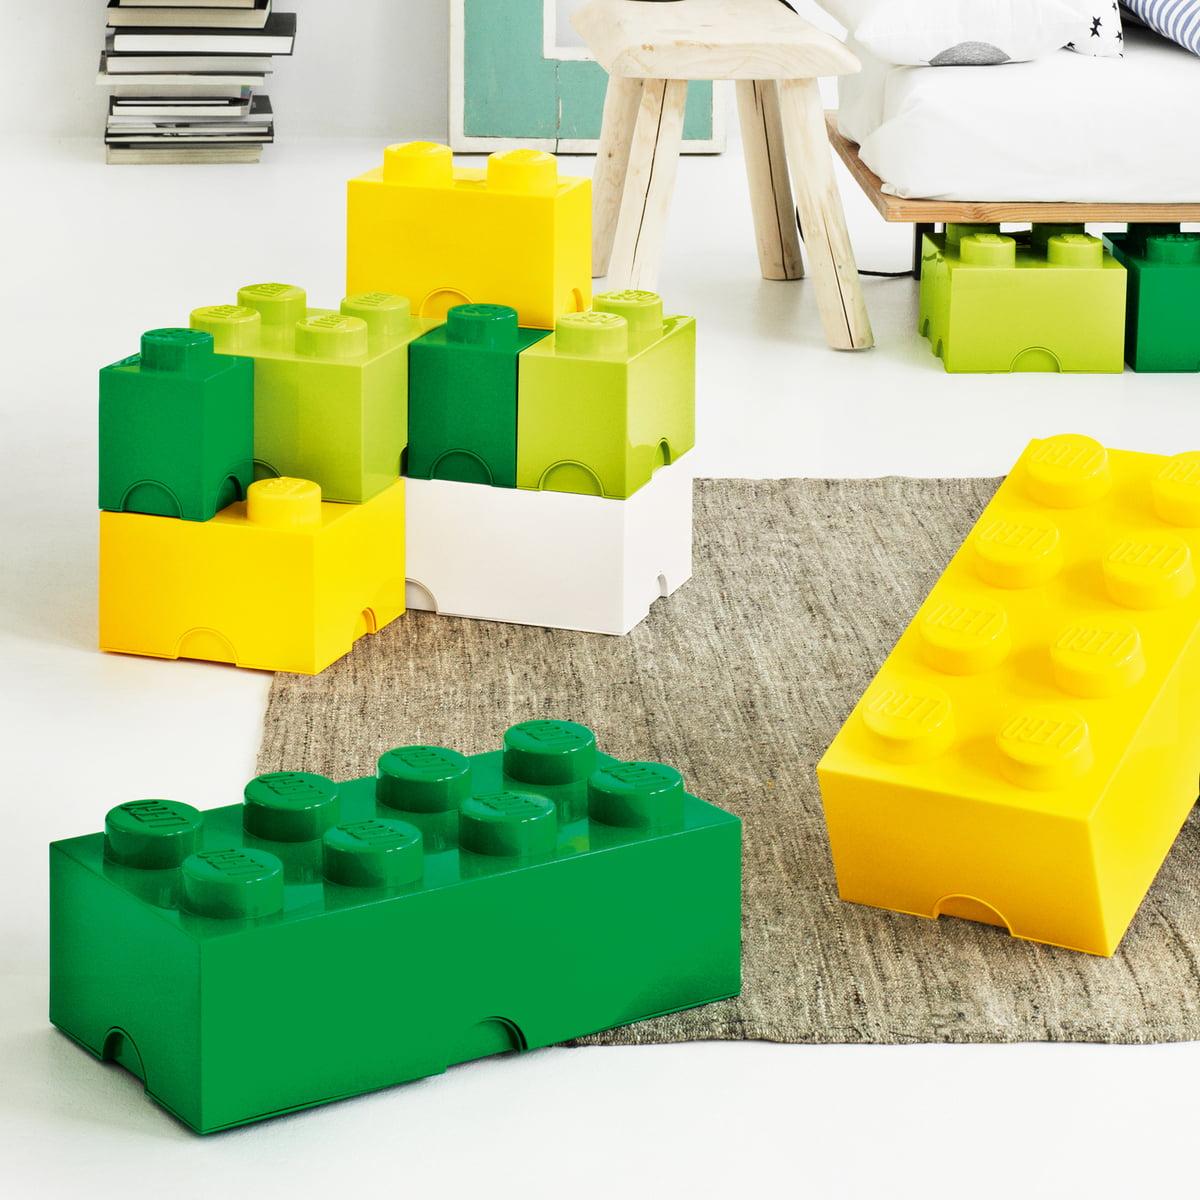 Superieur Lego   Storage Brick, Yellow, Green